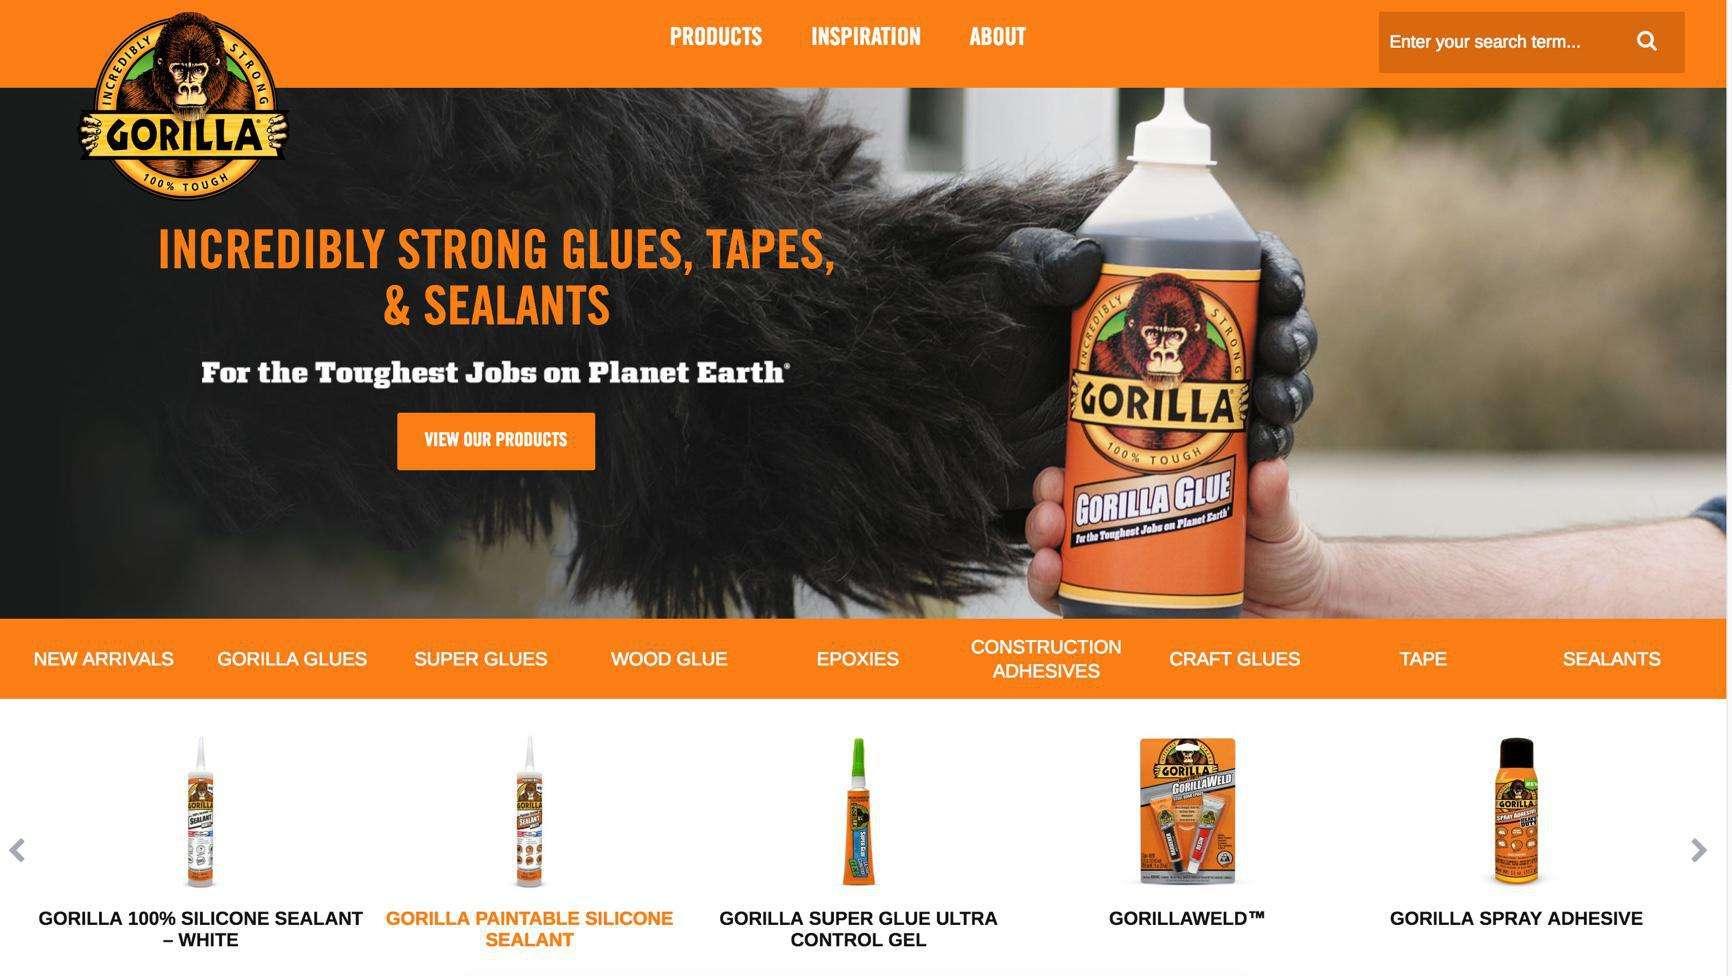 Gorilla Glue desktop website screenshot of products page